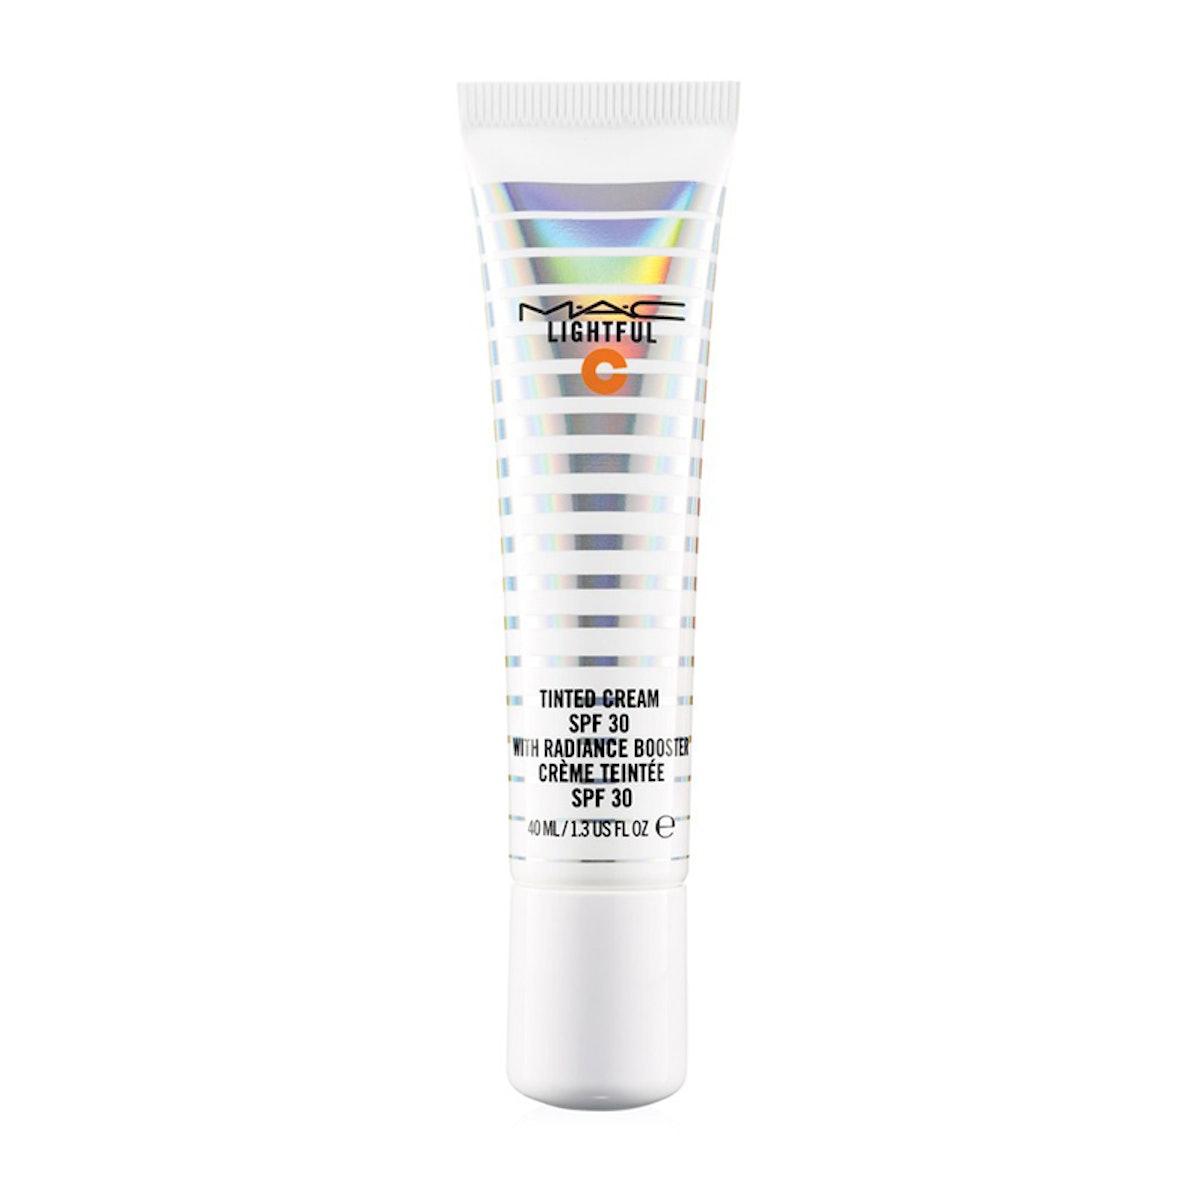 Lightful C Tinted Cream SPF 30